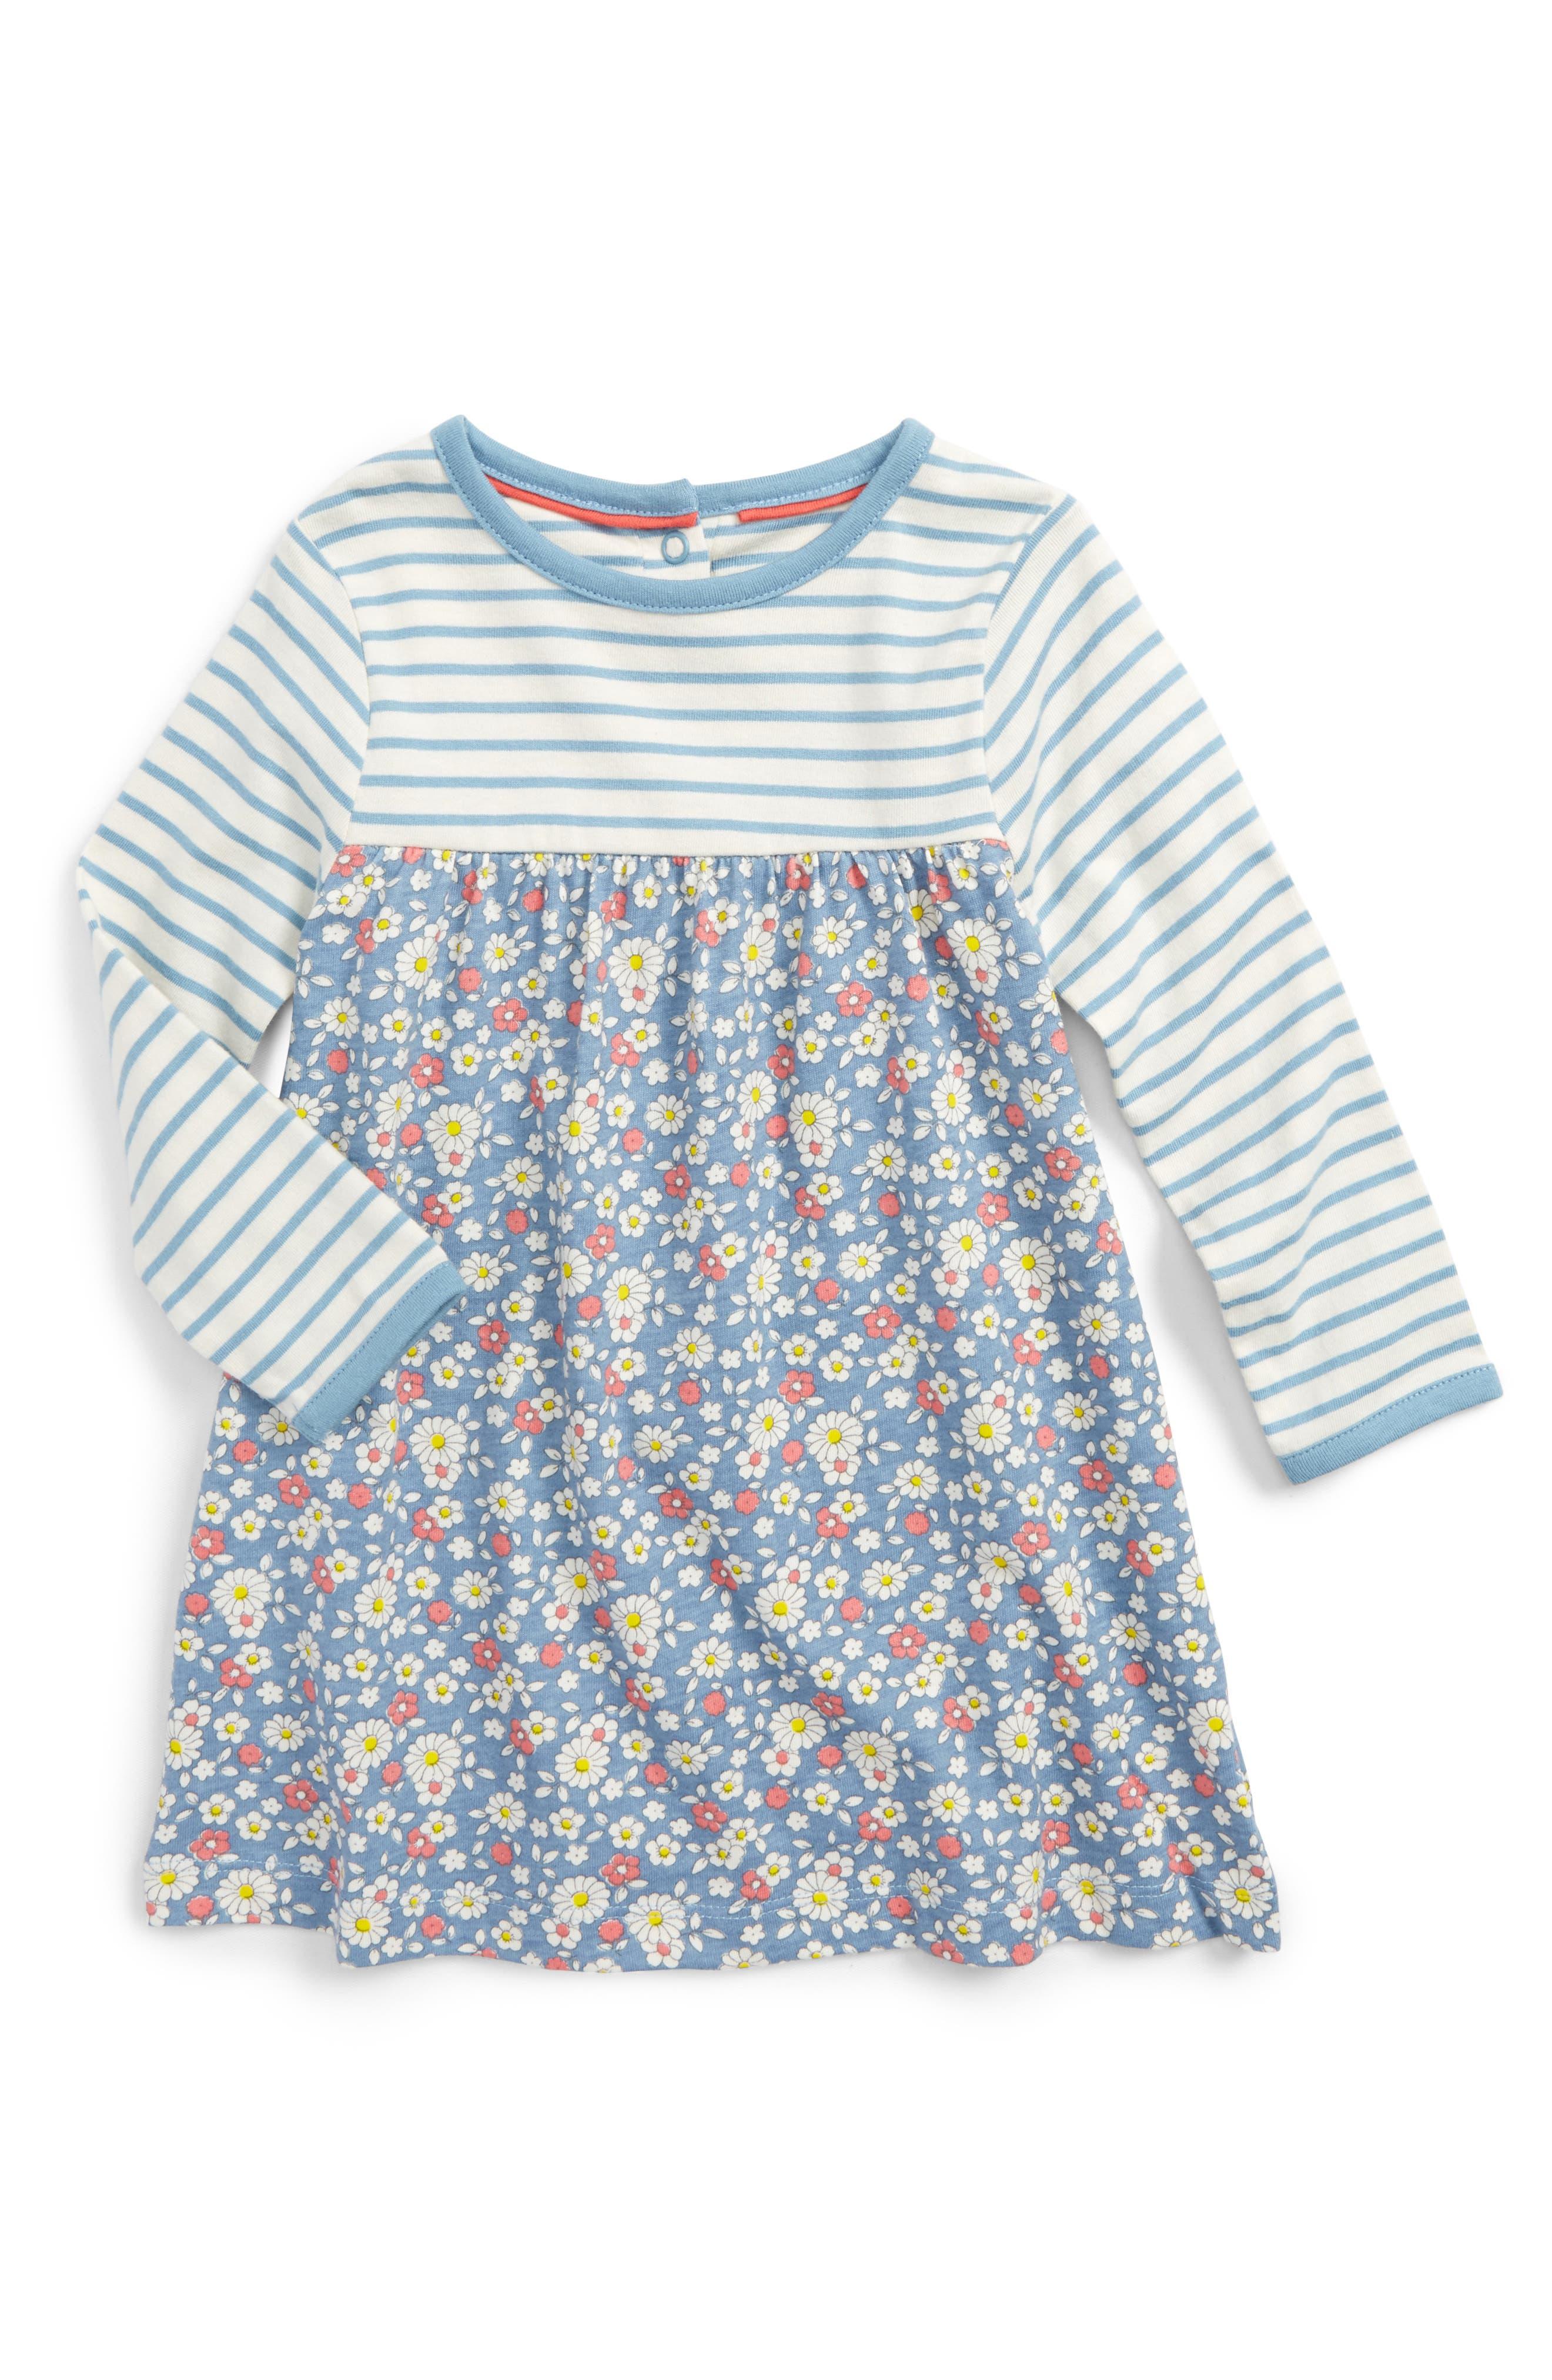 Hotchpotch Dress,                         Main,                         color, 400